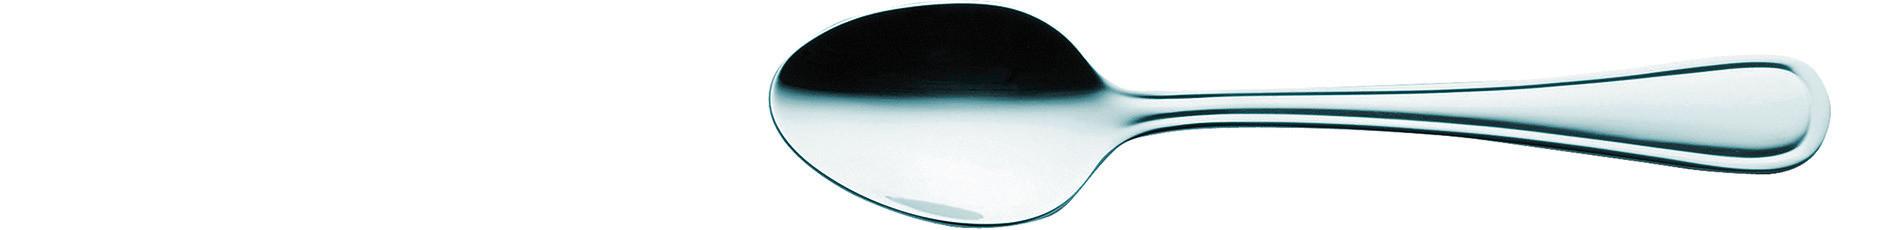 Selina, Dessertlöffel 186 mm